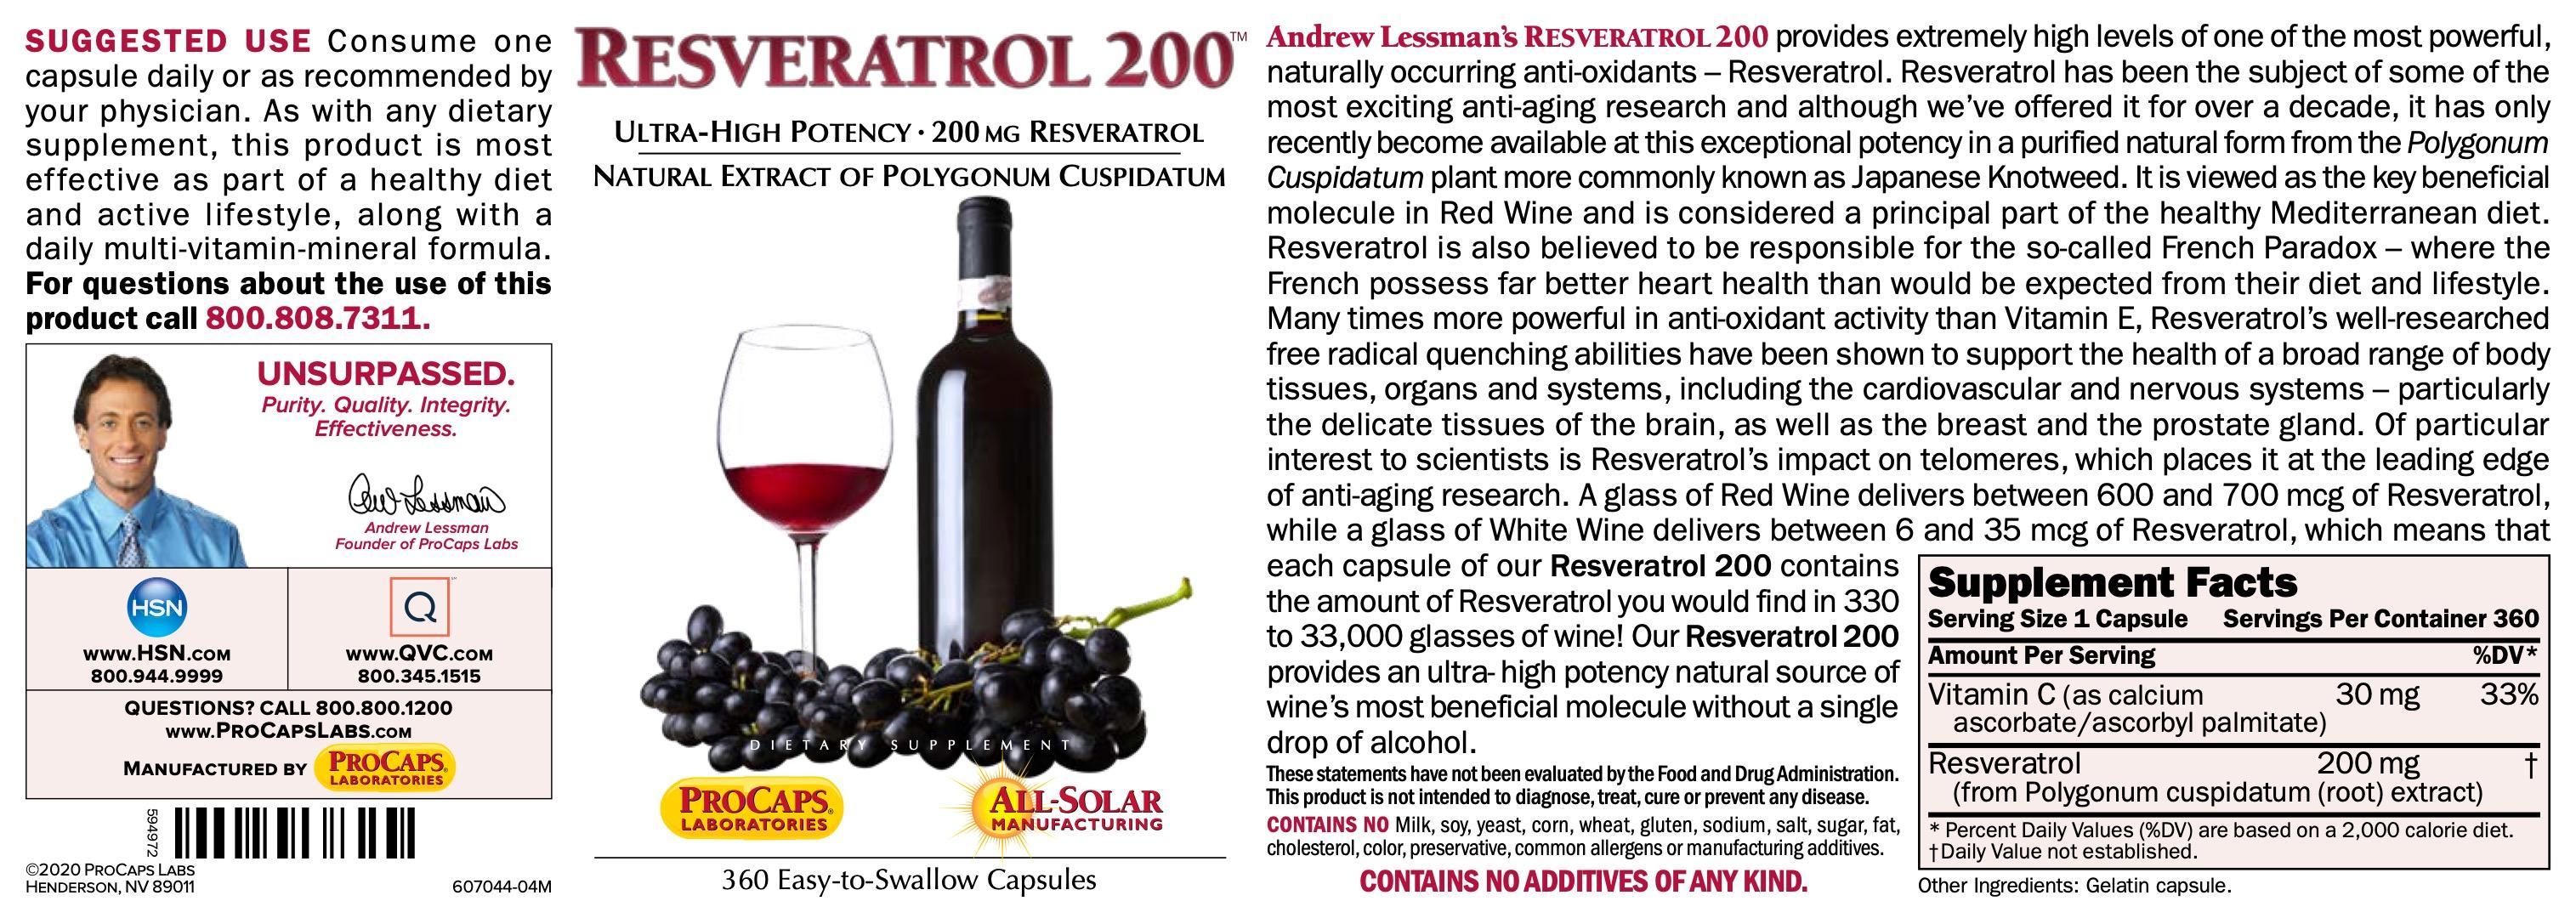 Resveratrol-200-Capsules-Anti-oxidants